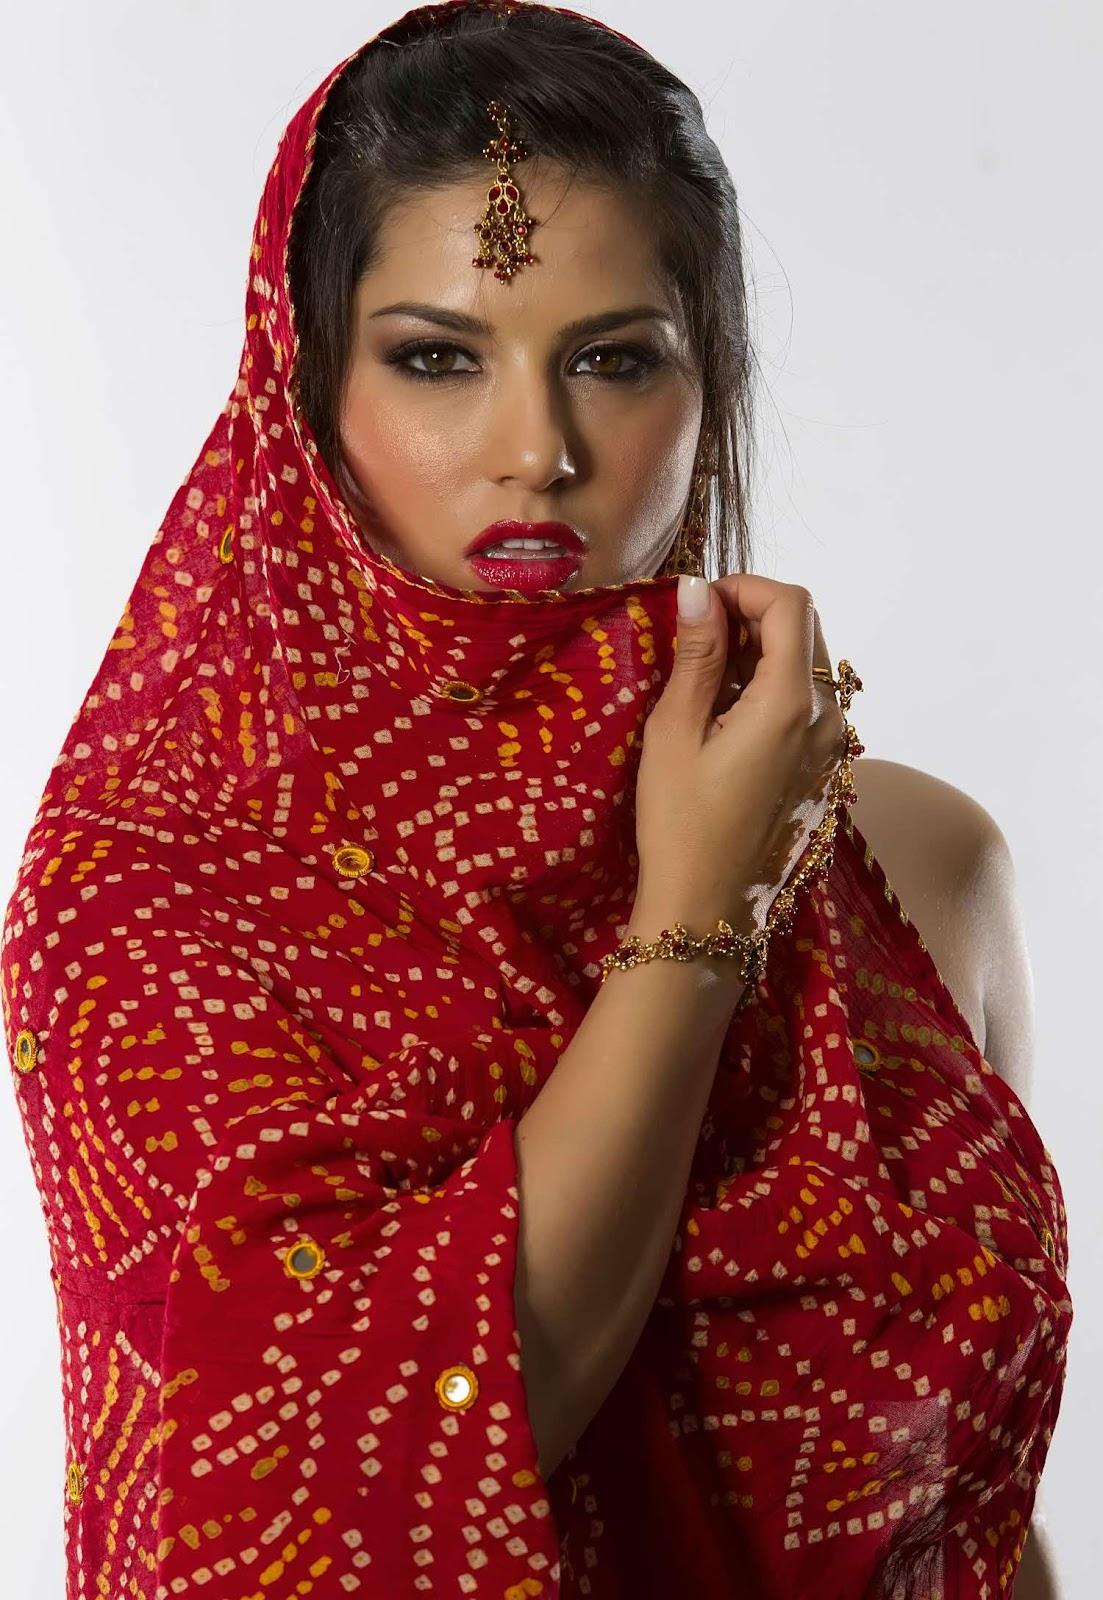 Hindi xx sunny leone Naked Pov - Uhfsae